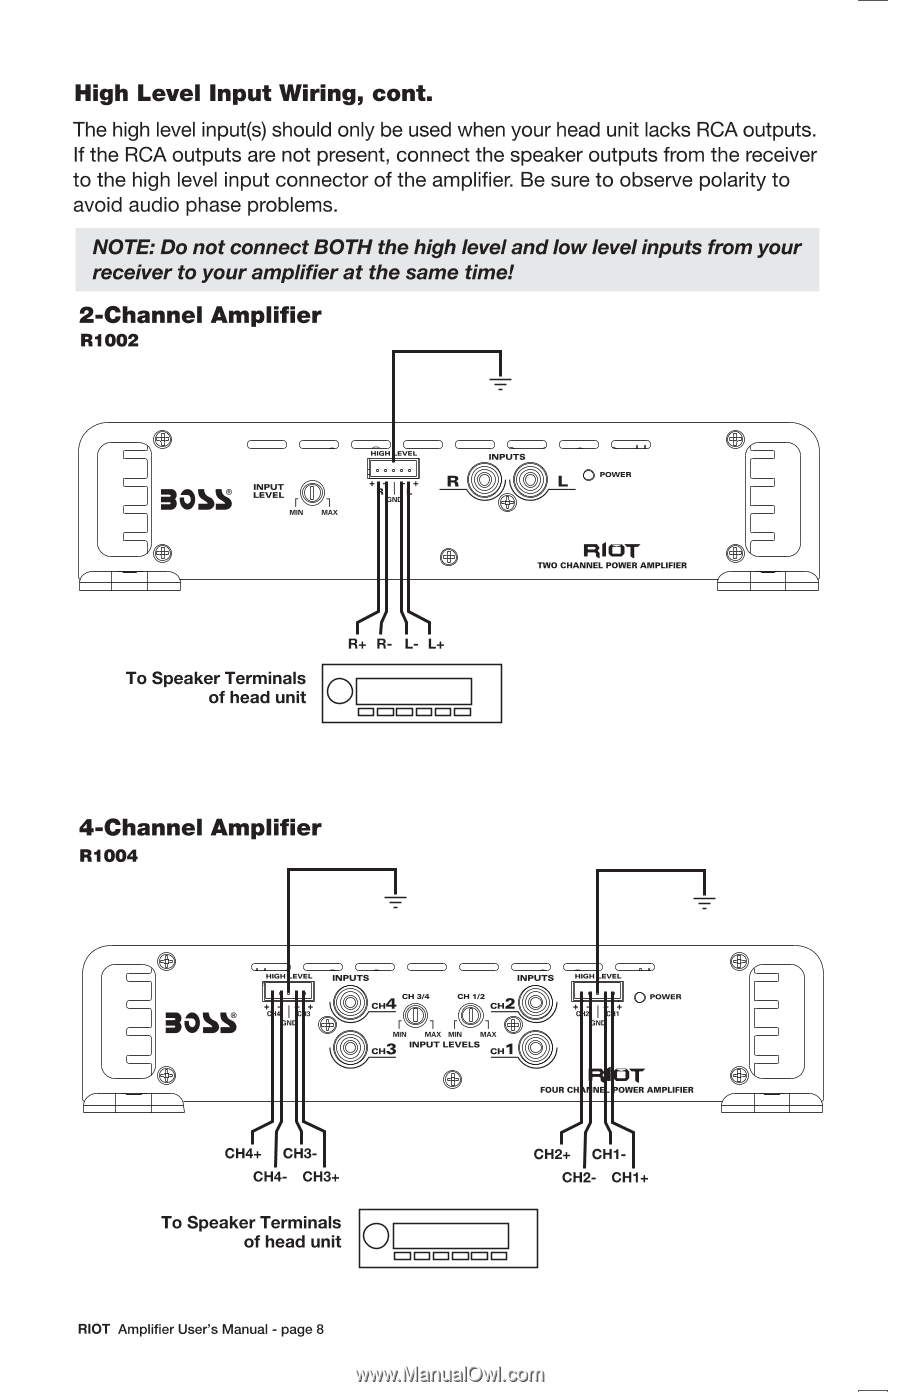 medium resolution of  boss r1004 wiring diagram wiring diagram schematics on boss amp manual boss car radio boss audio